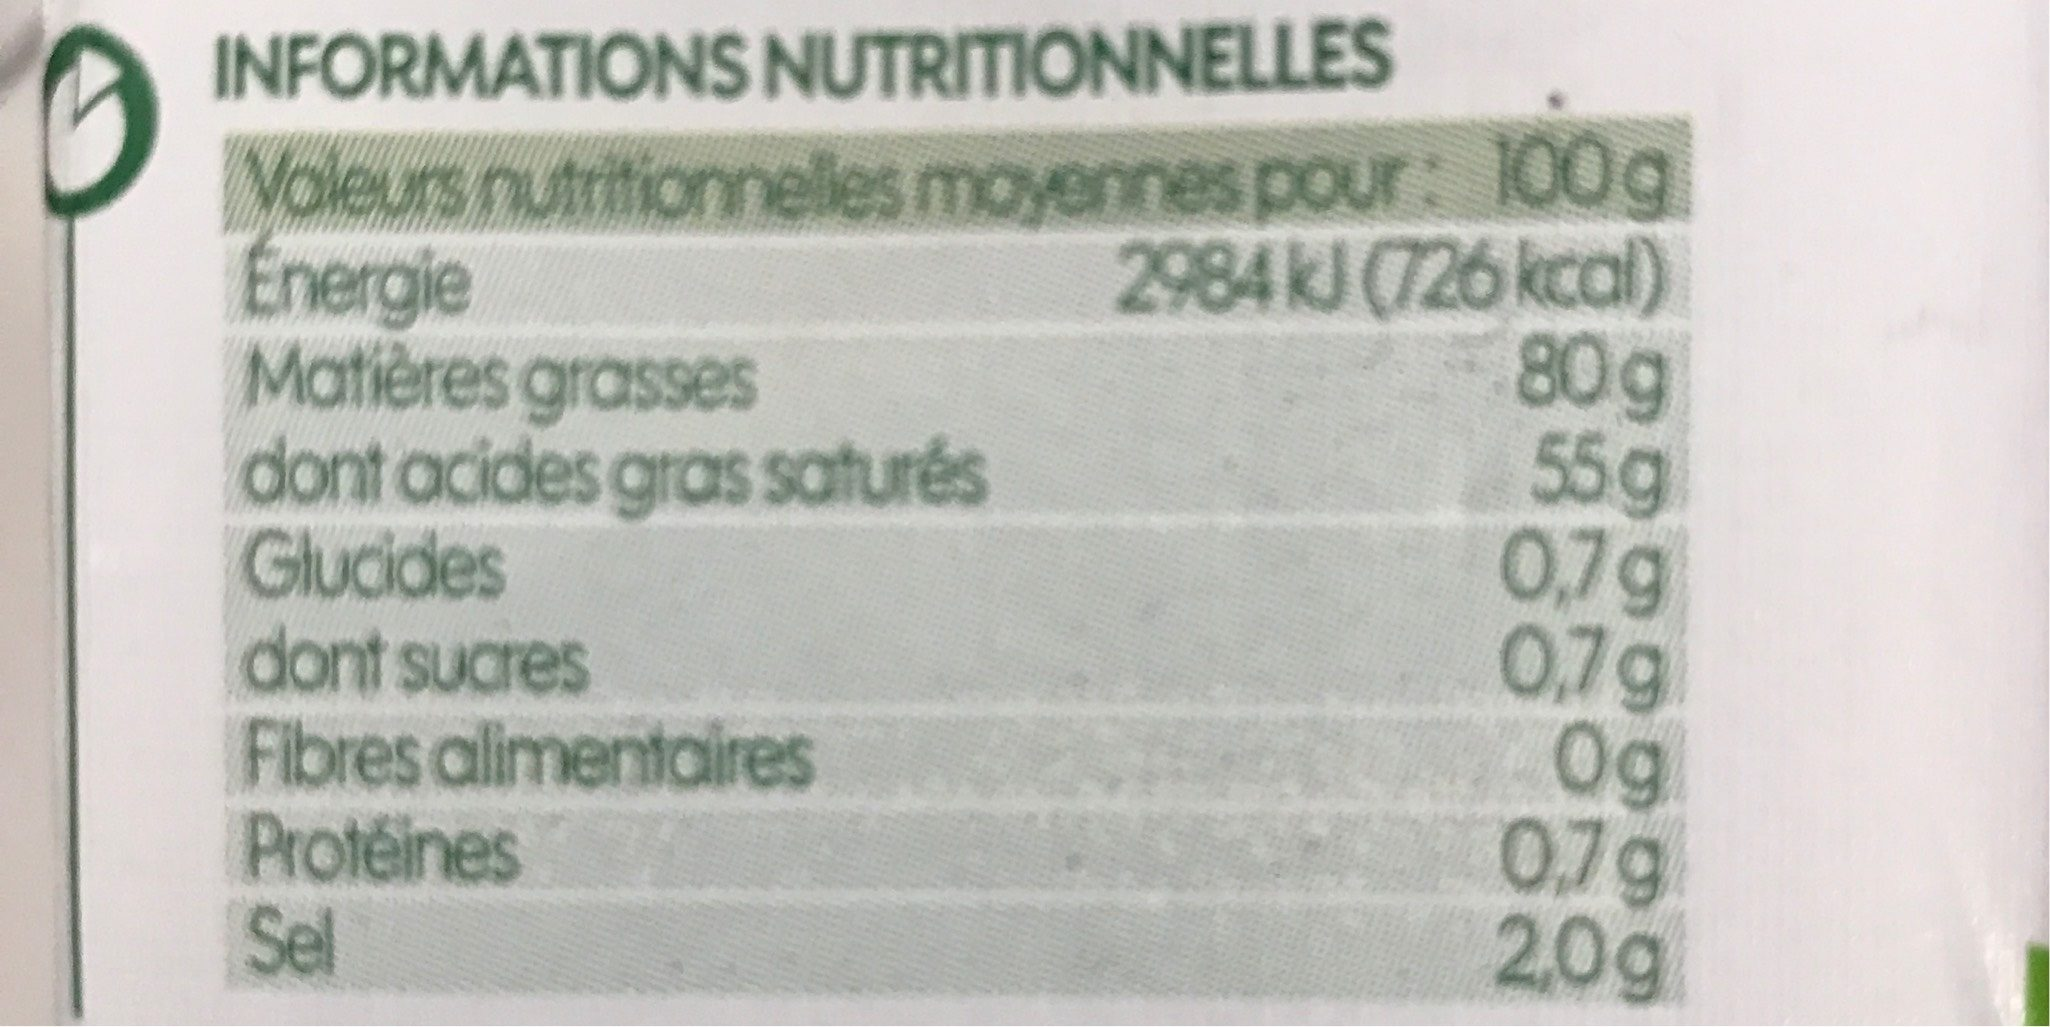 Beurre demi-sel 80%mg - Informations nutritionnelles